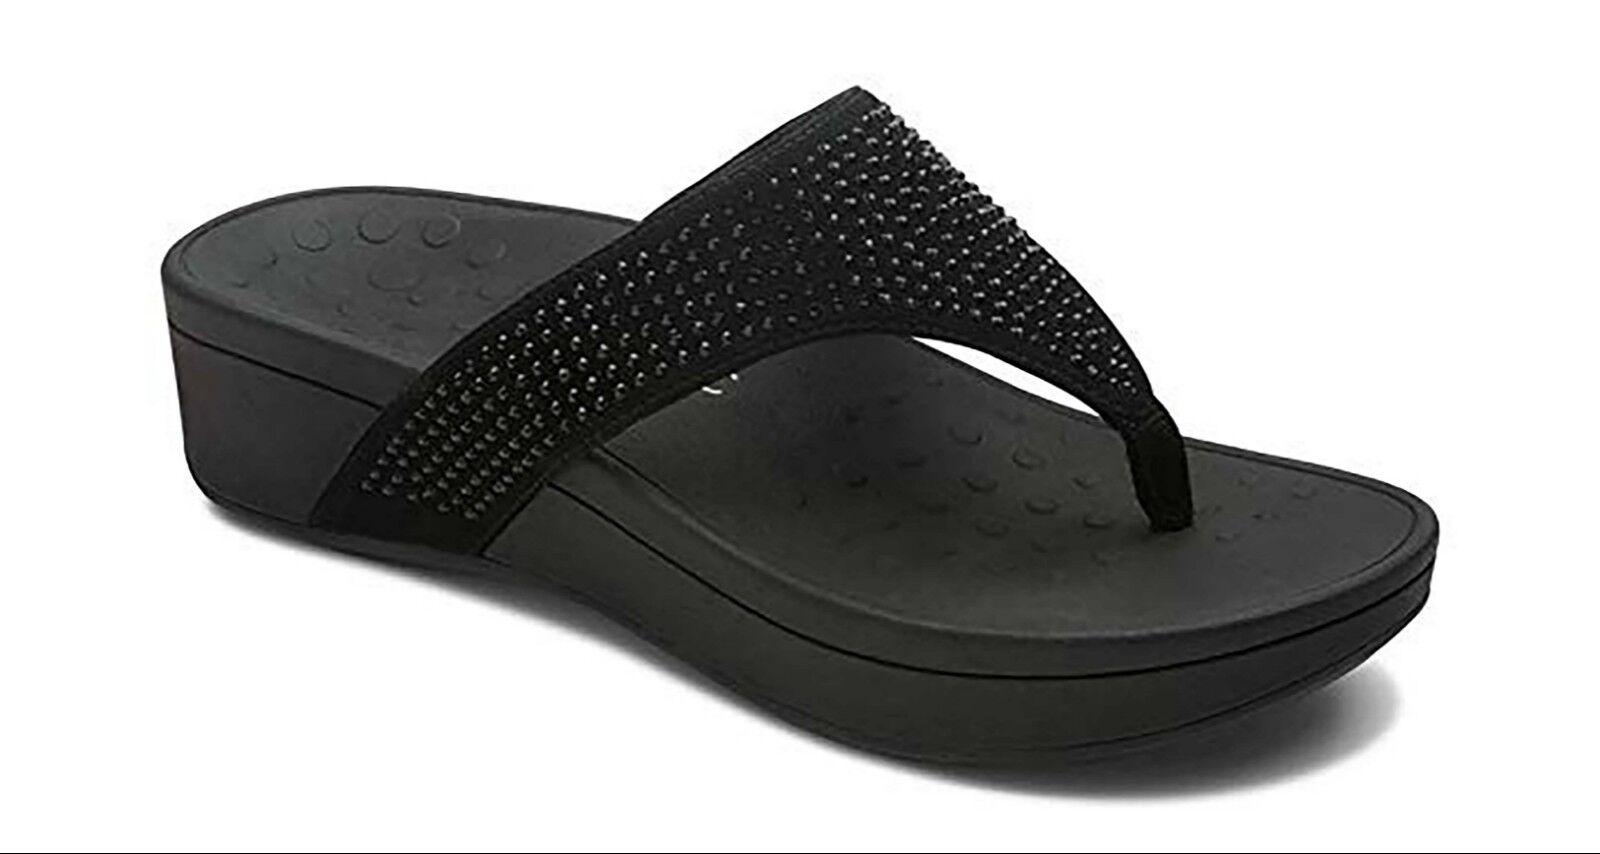 Vionic Women's Naples Slip-On Thong Sandals, Black Size 8